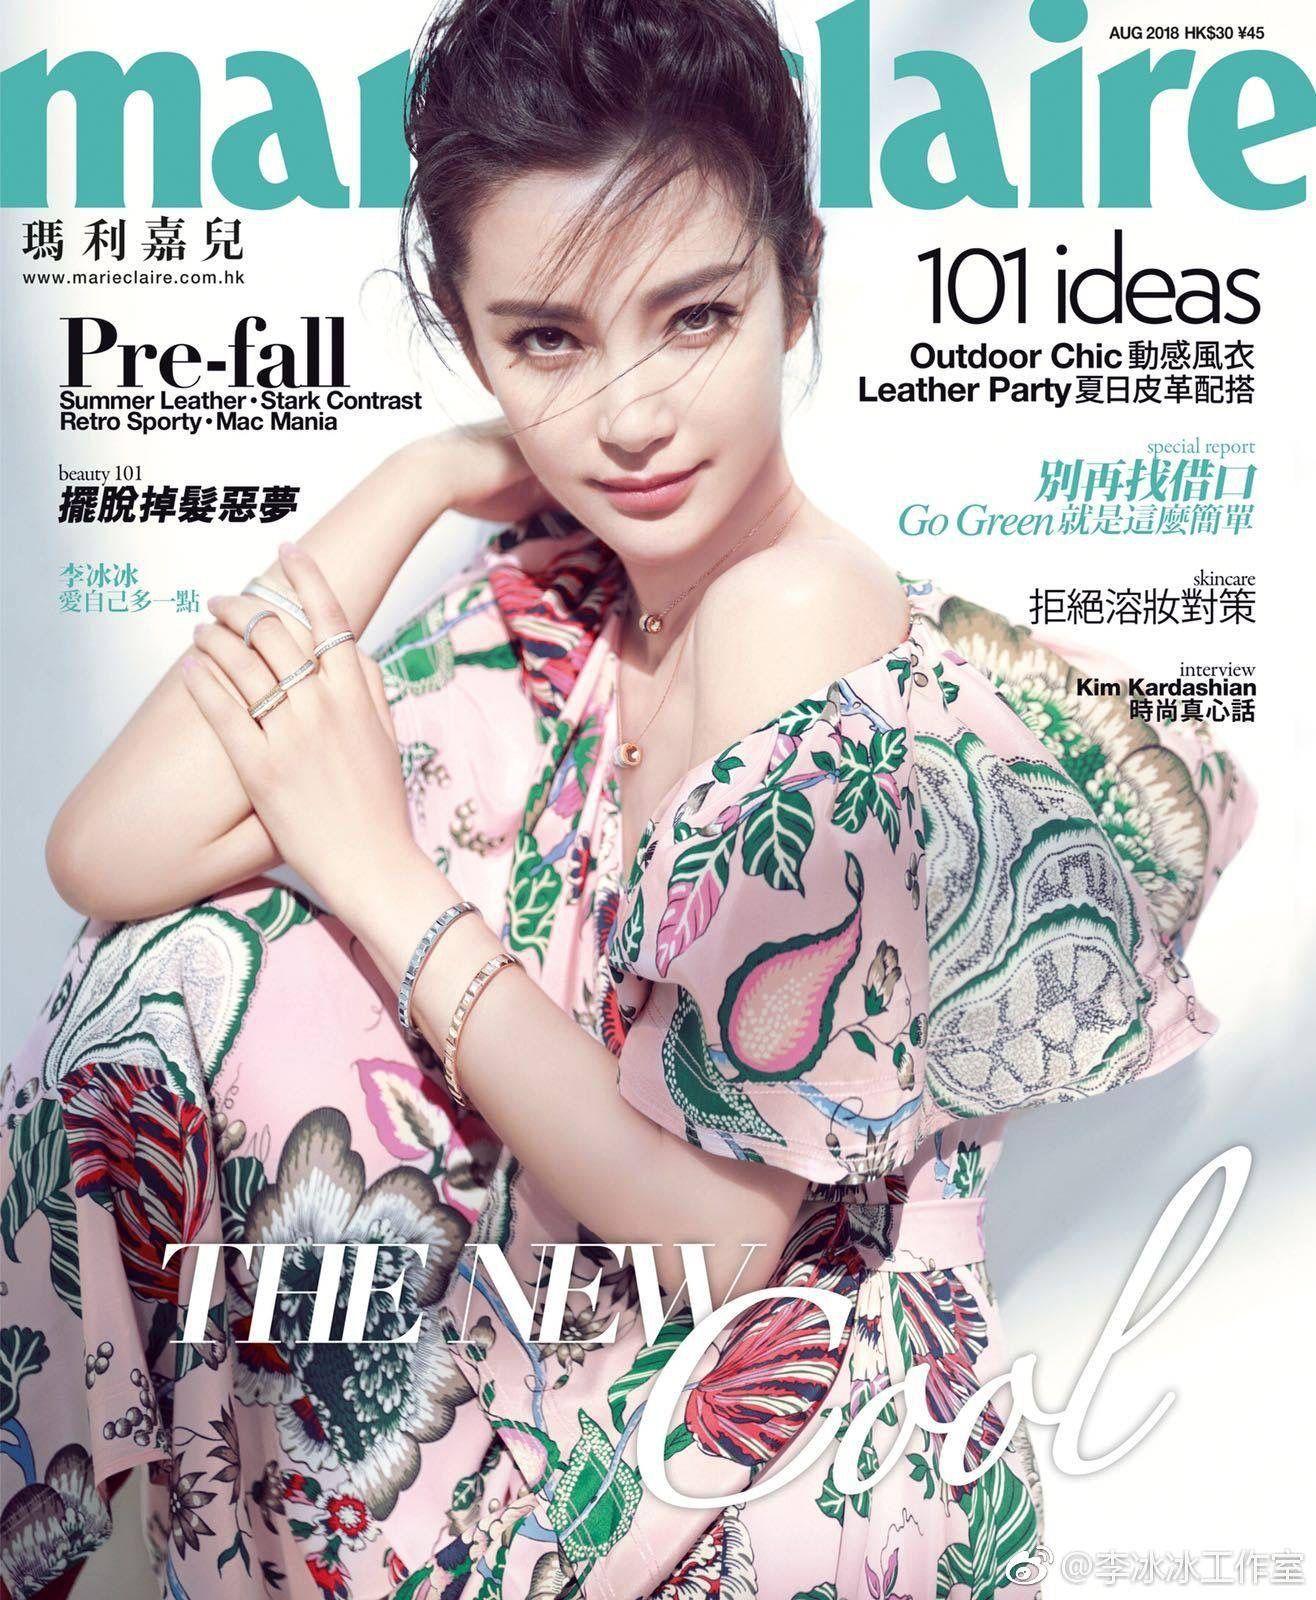 Bing World Beauty: Marie Claire, Kim Kardashian Interview